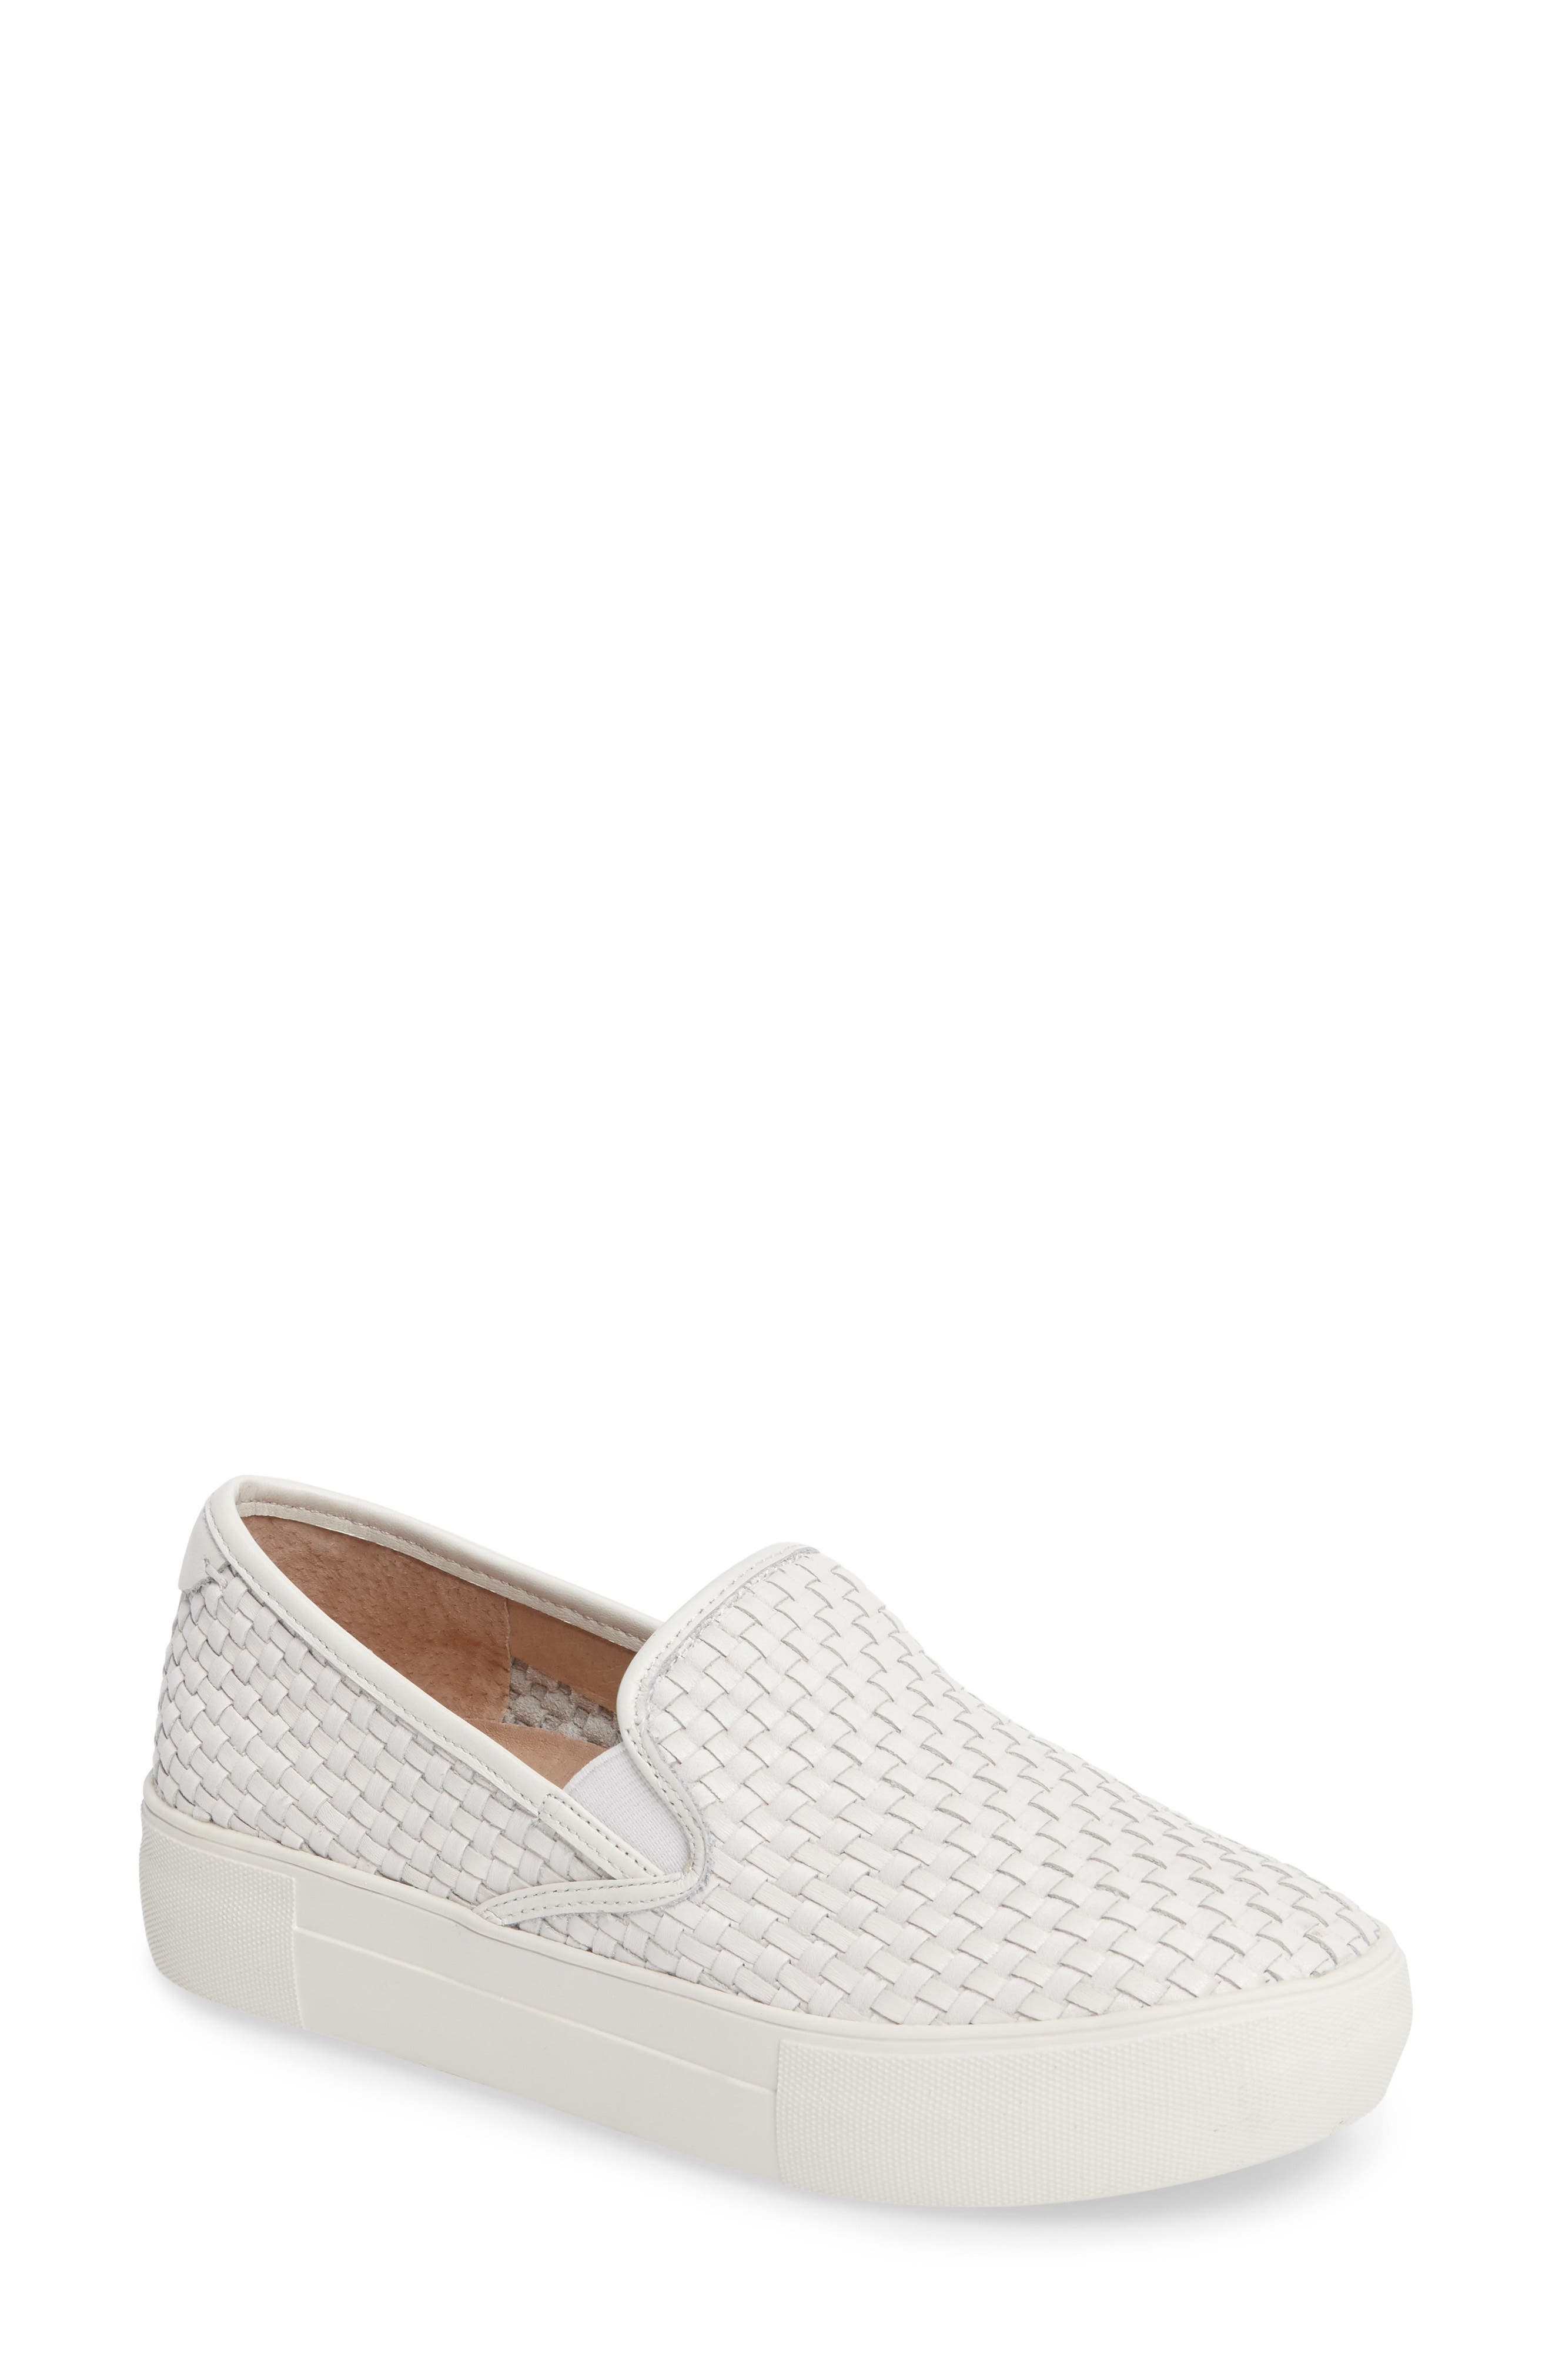 JSLIDES Alyssa Platform Slip-On Sneaker